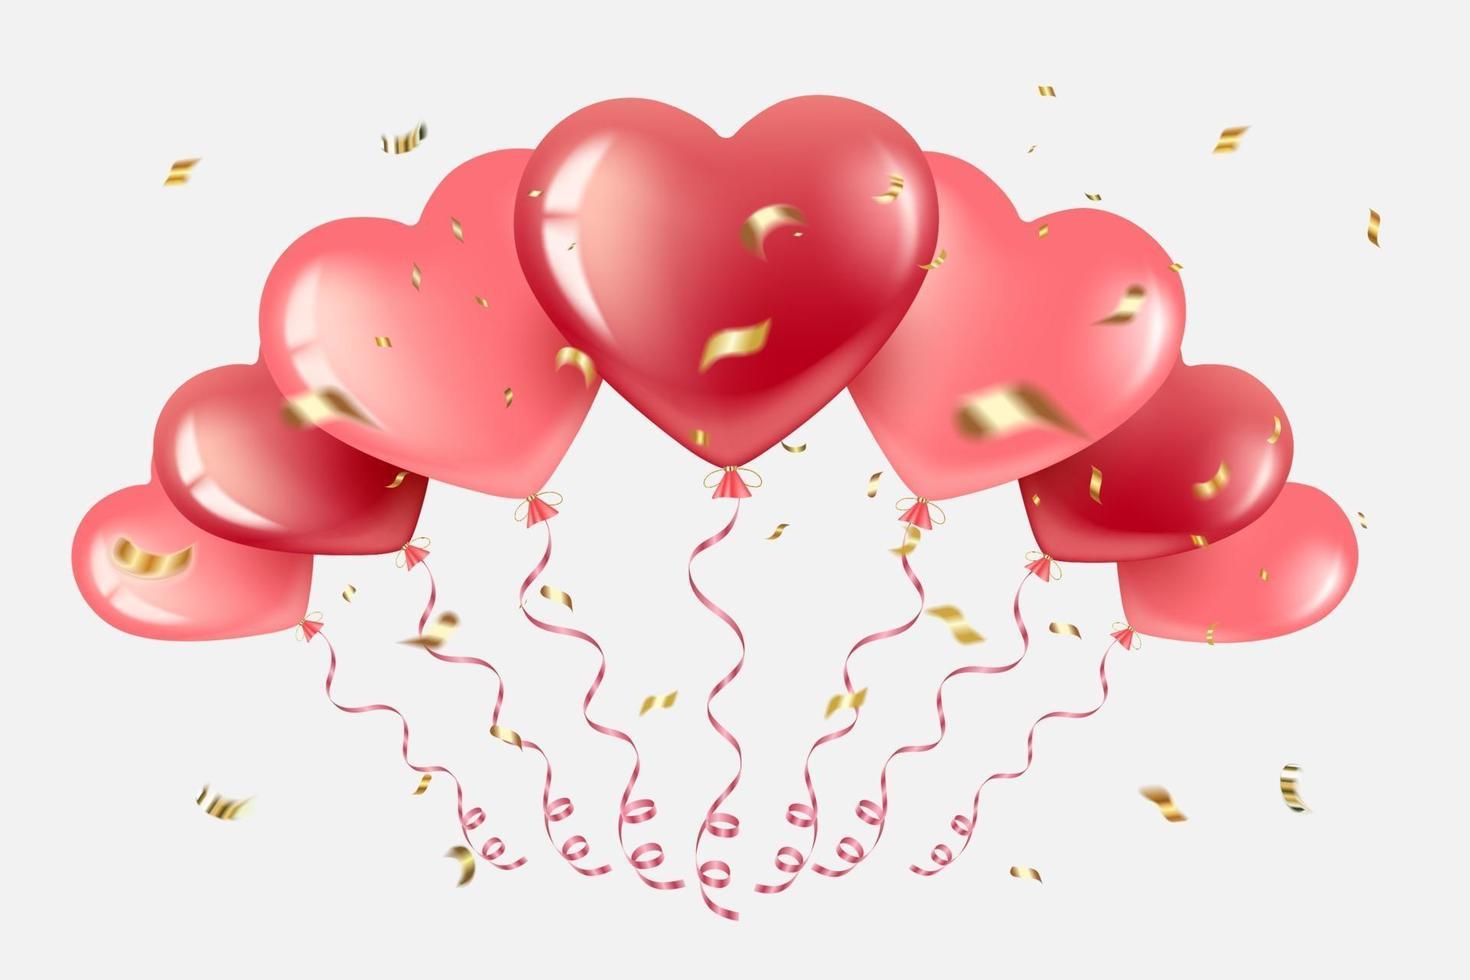 hart ballonnen met gouden confetti vector